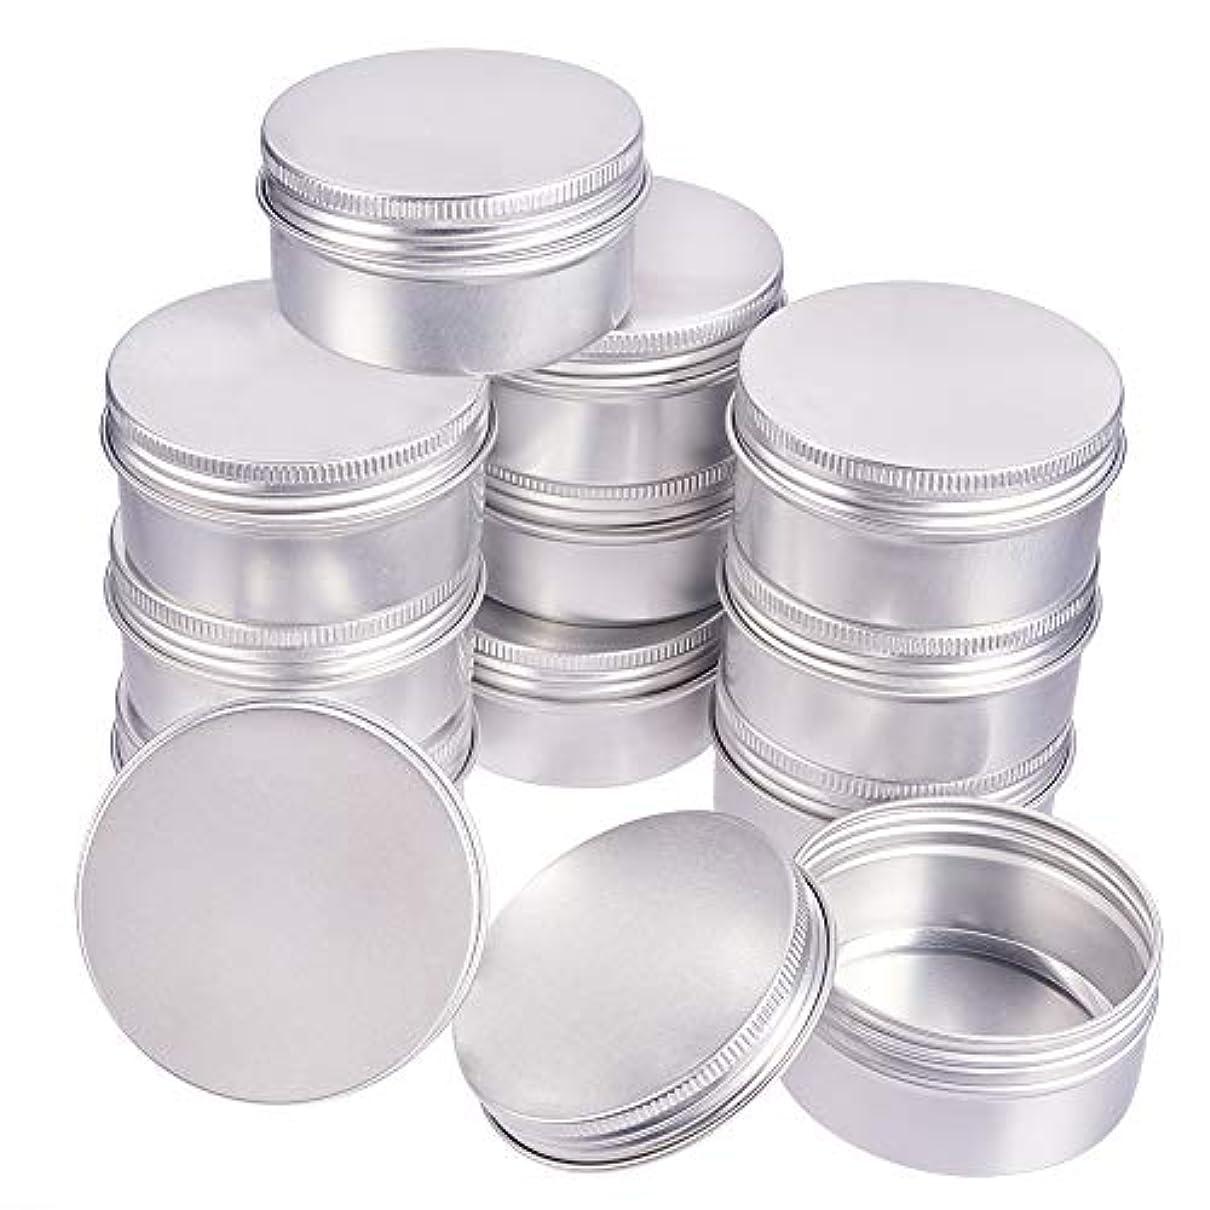 BENECREAT 12個セット 80mlアルミ缶 アルミネジキャップ缶 小分け容器 詰め替え容器 クリームケース 化粧品?クリーム?小物用収納ボックス シルバー